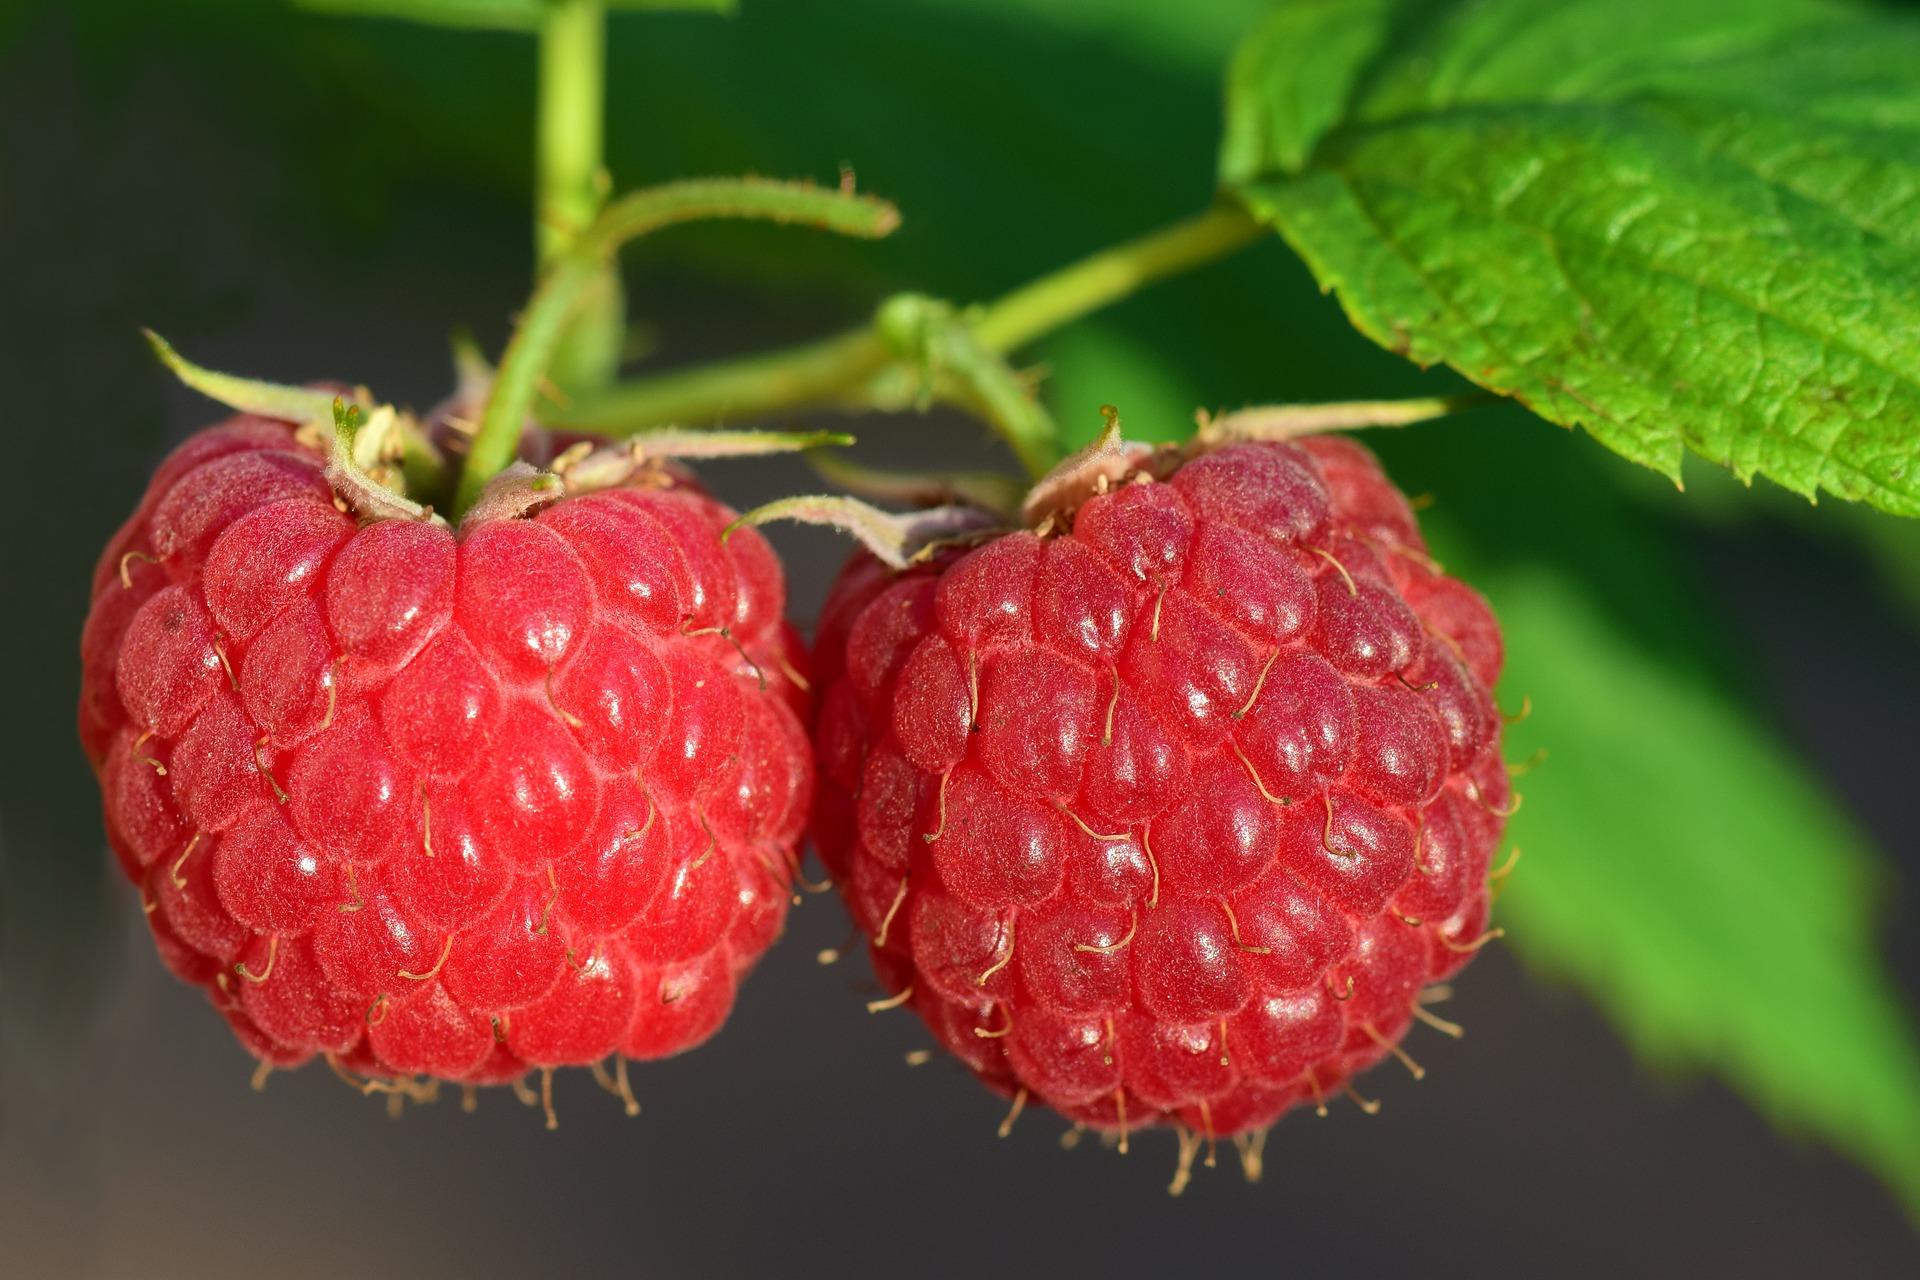 A Few Tips on Planting Raspberries